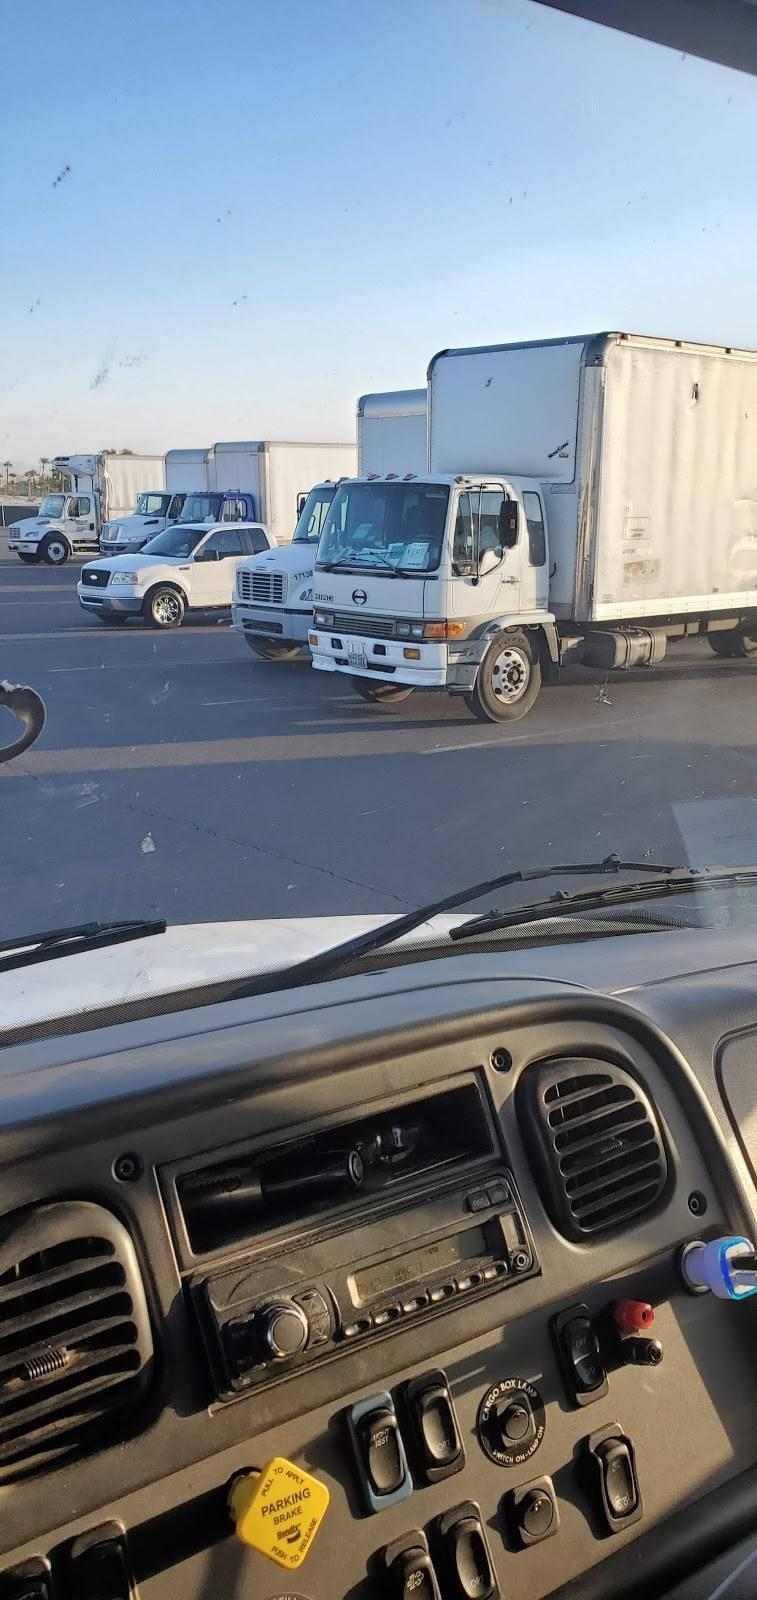 GES Marshaling Yard - moving company  | Photo 4 of 8 | Address: 2982 W Post Rd, Las Vegas, NV 89119, USA | Phone: (702) 263-0234